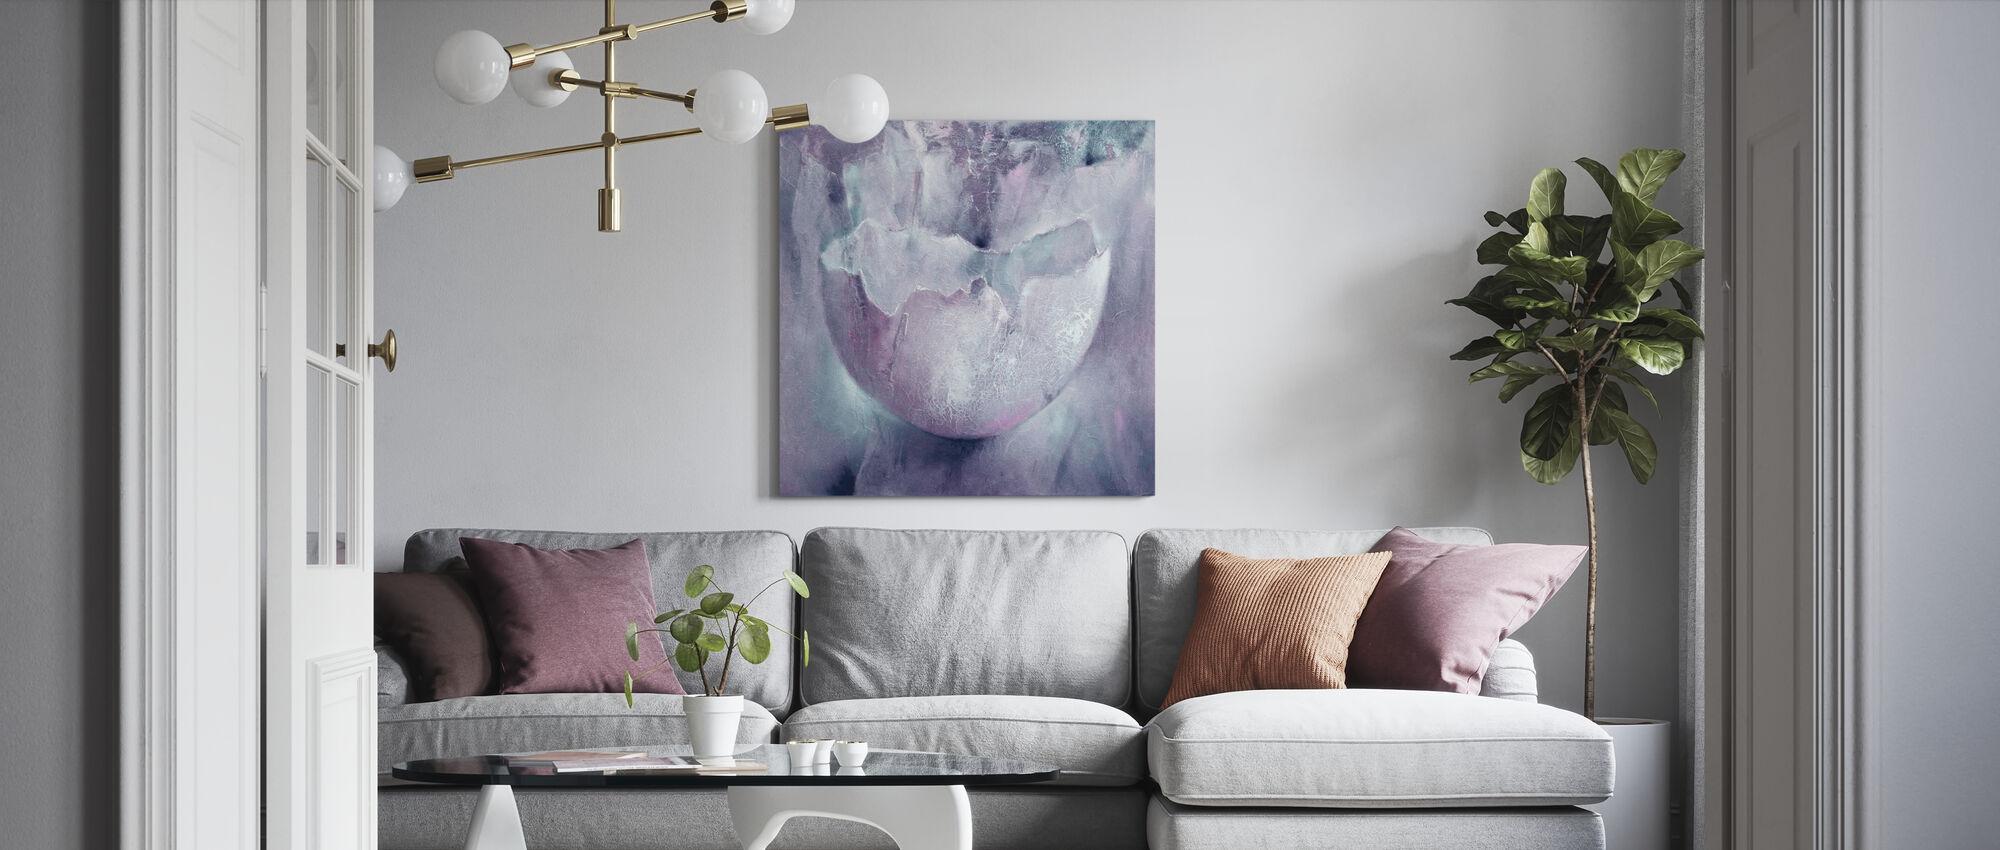 Eggshell - Canvas print - Living Room